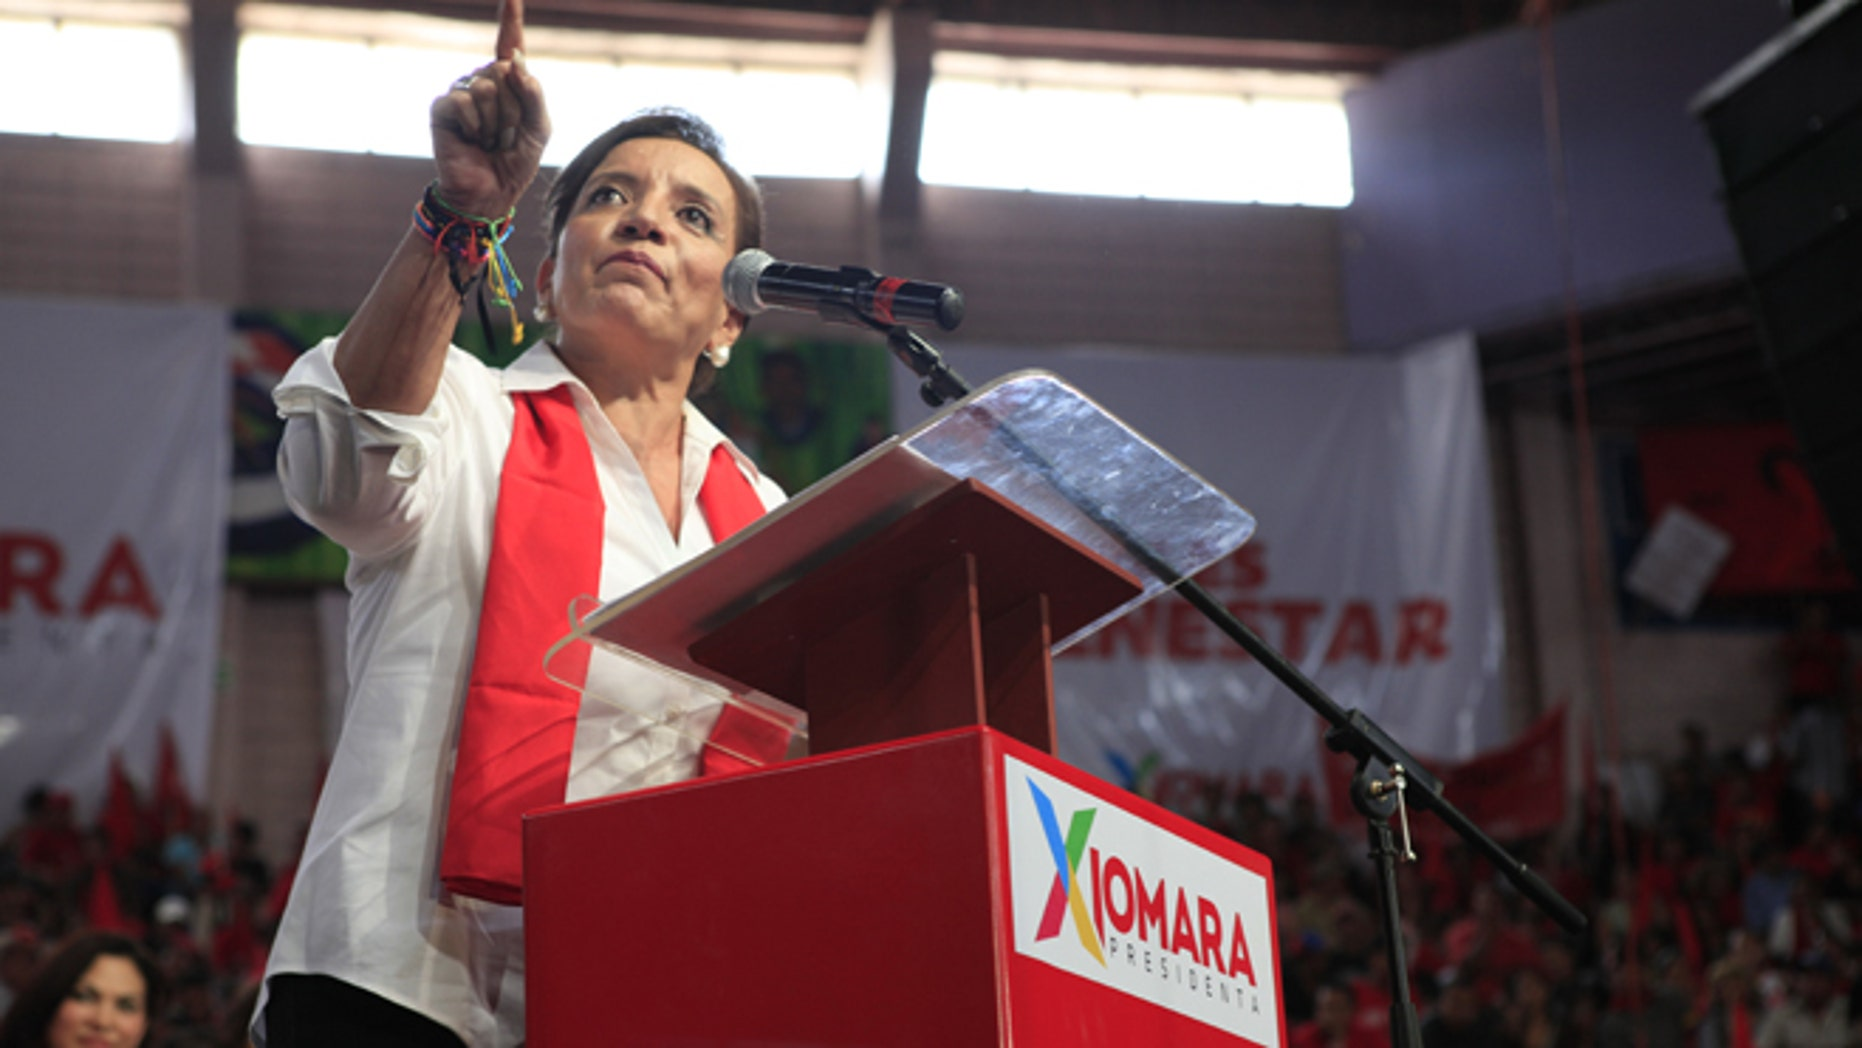 Presidential candidate Xiomara Castro in Tegucigalpa, Honduras, Sunday, June 16, 2013.